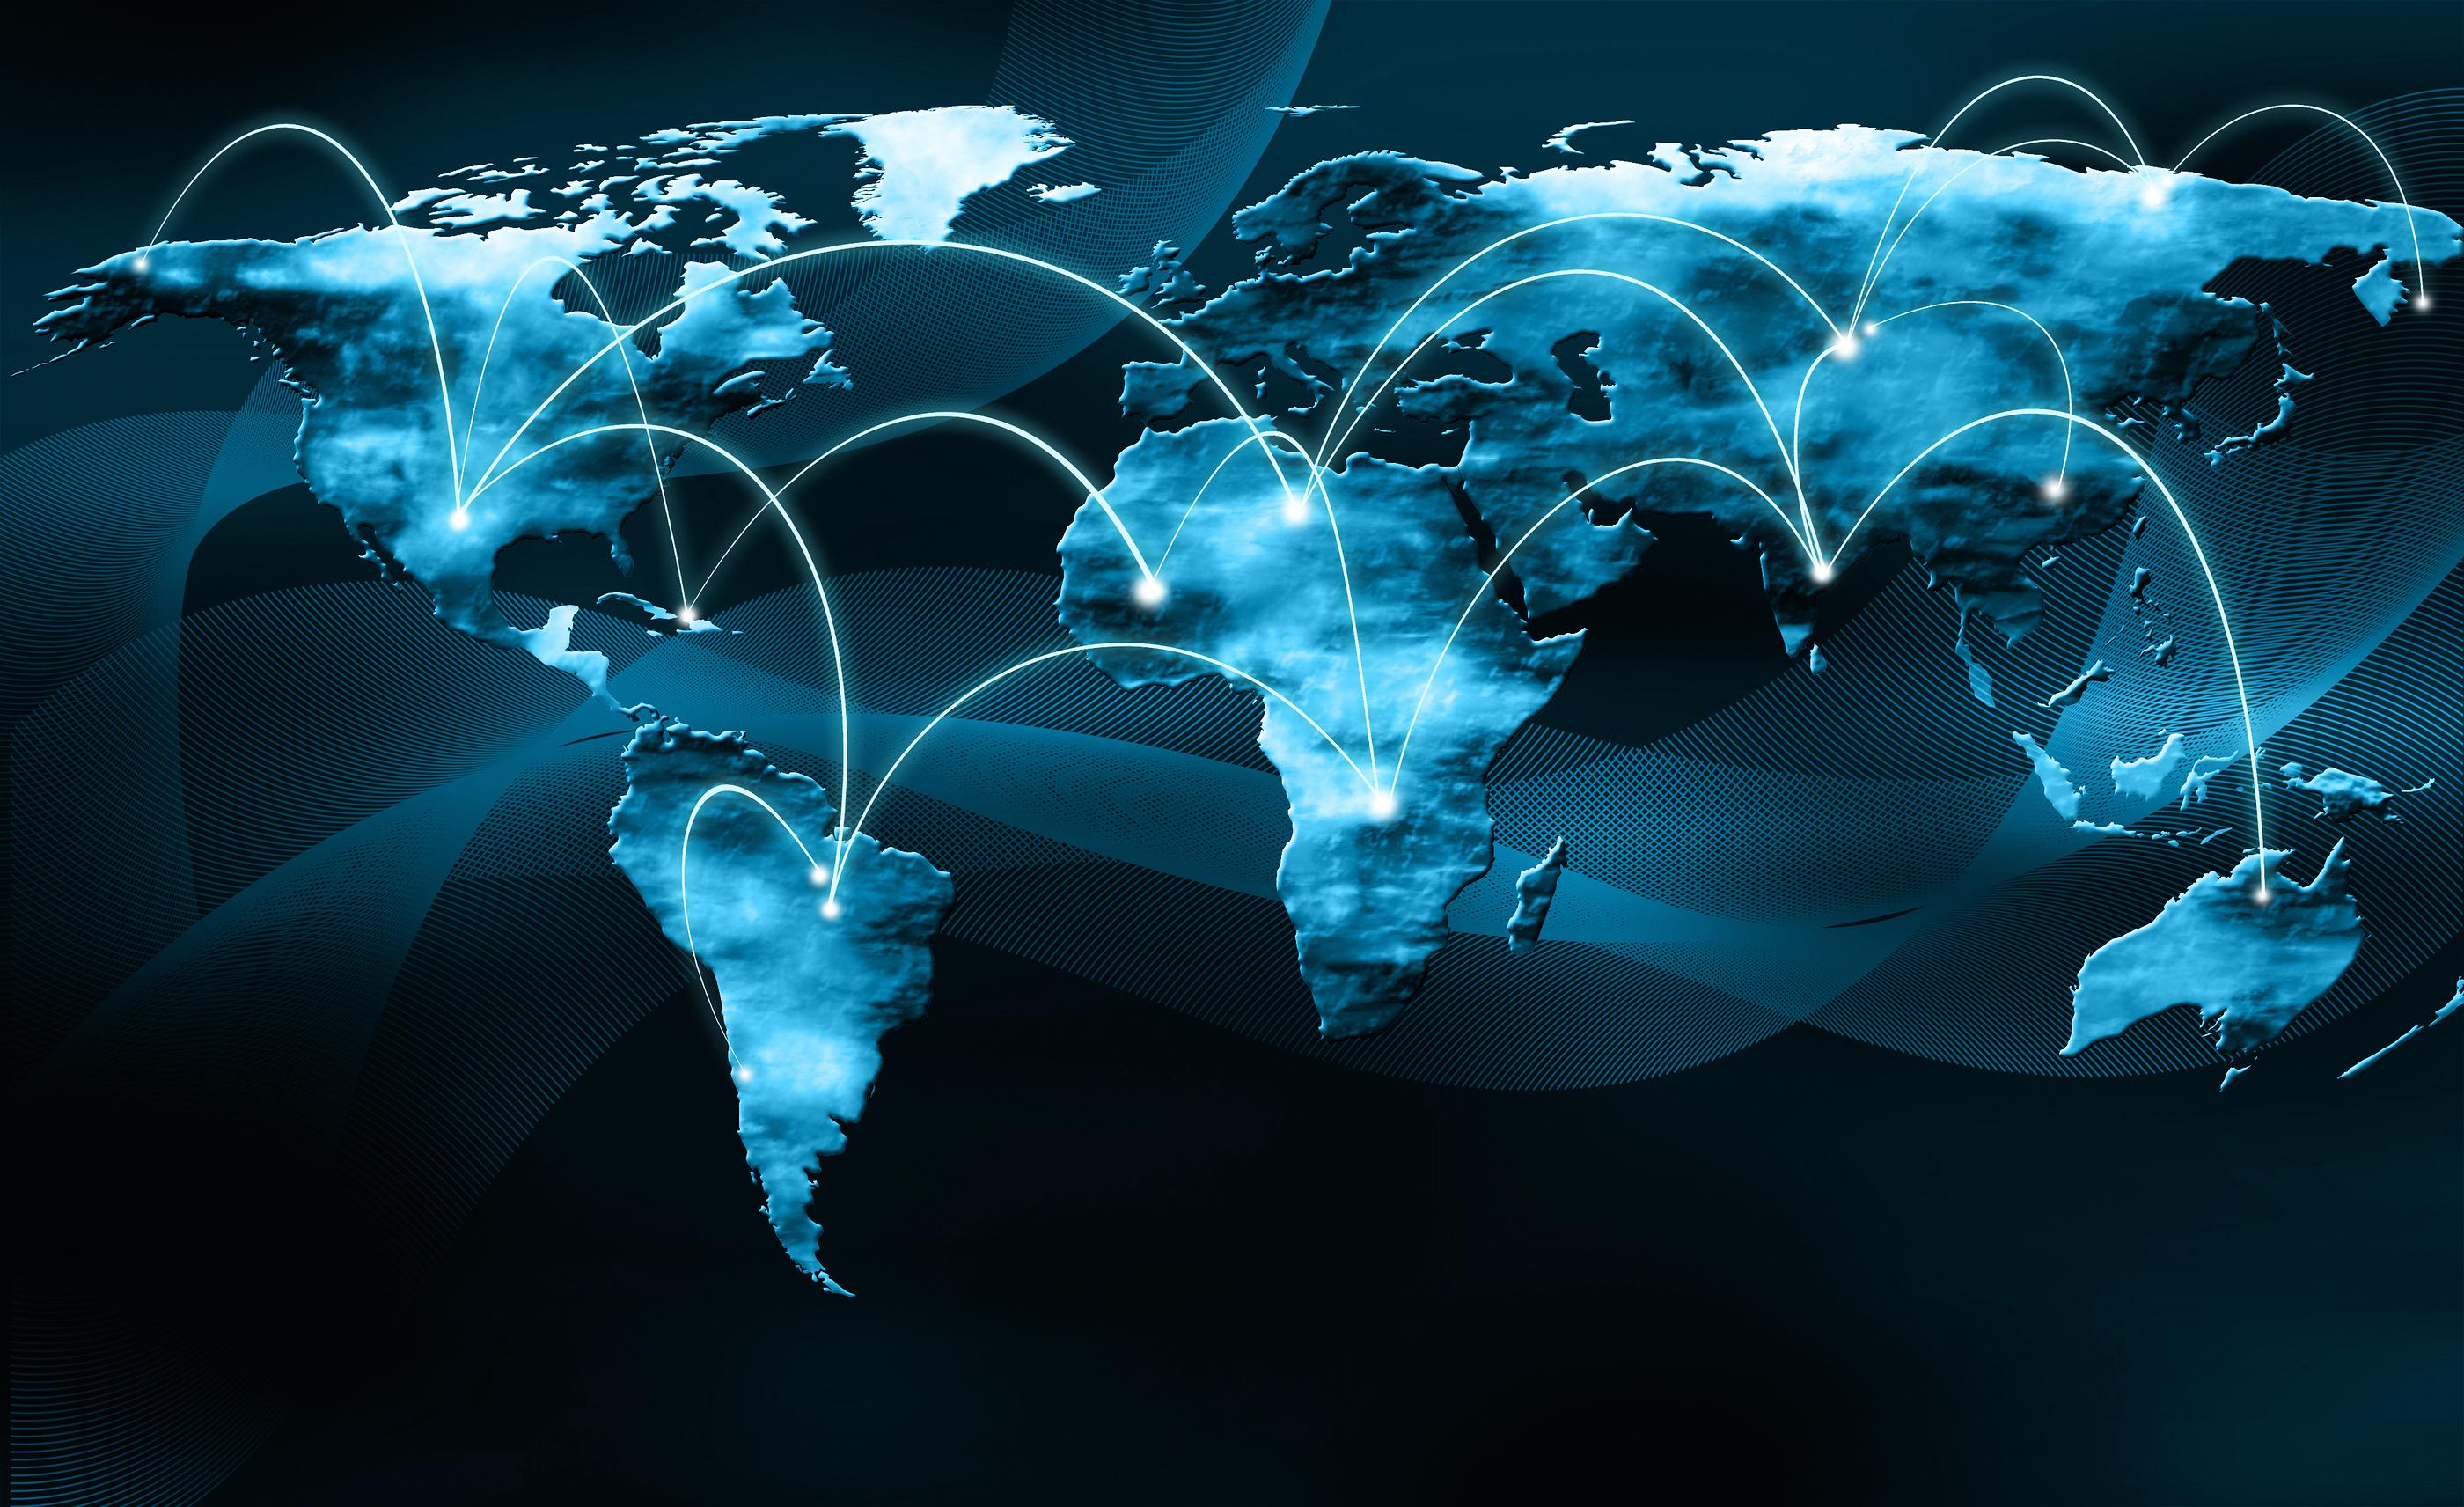 Картинка цифрового мира